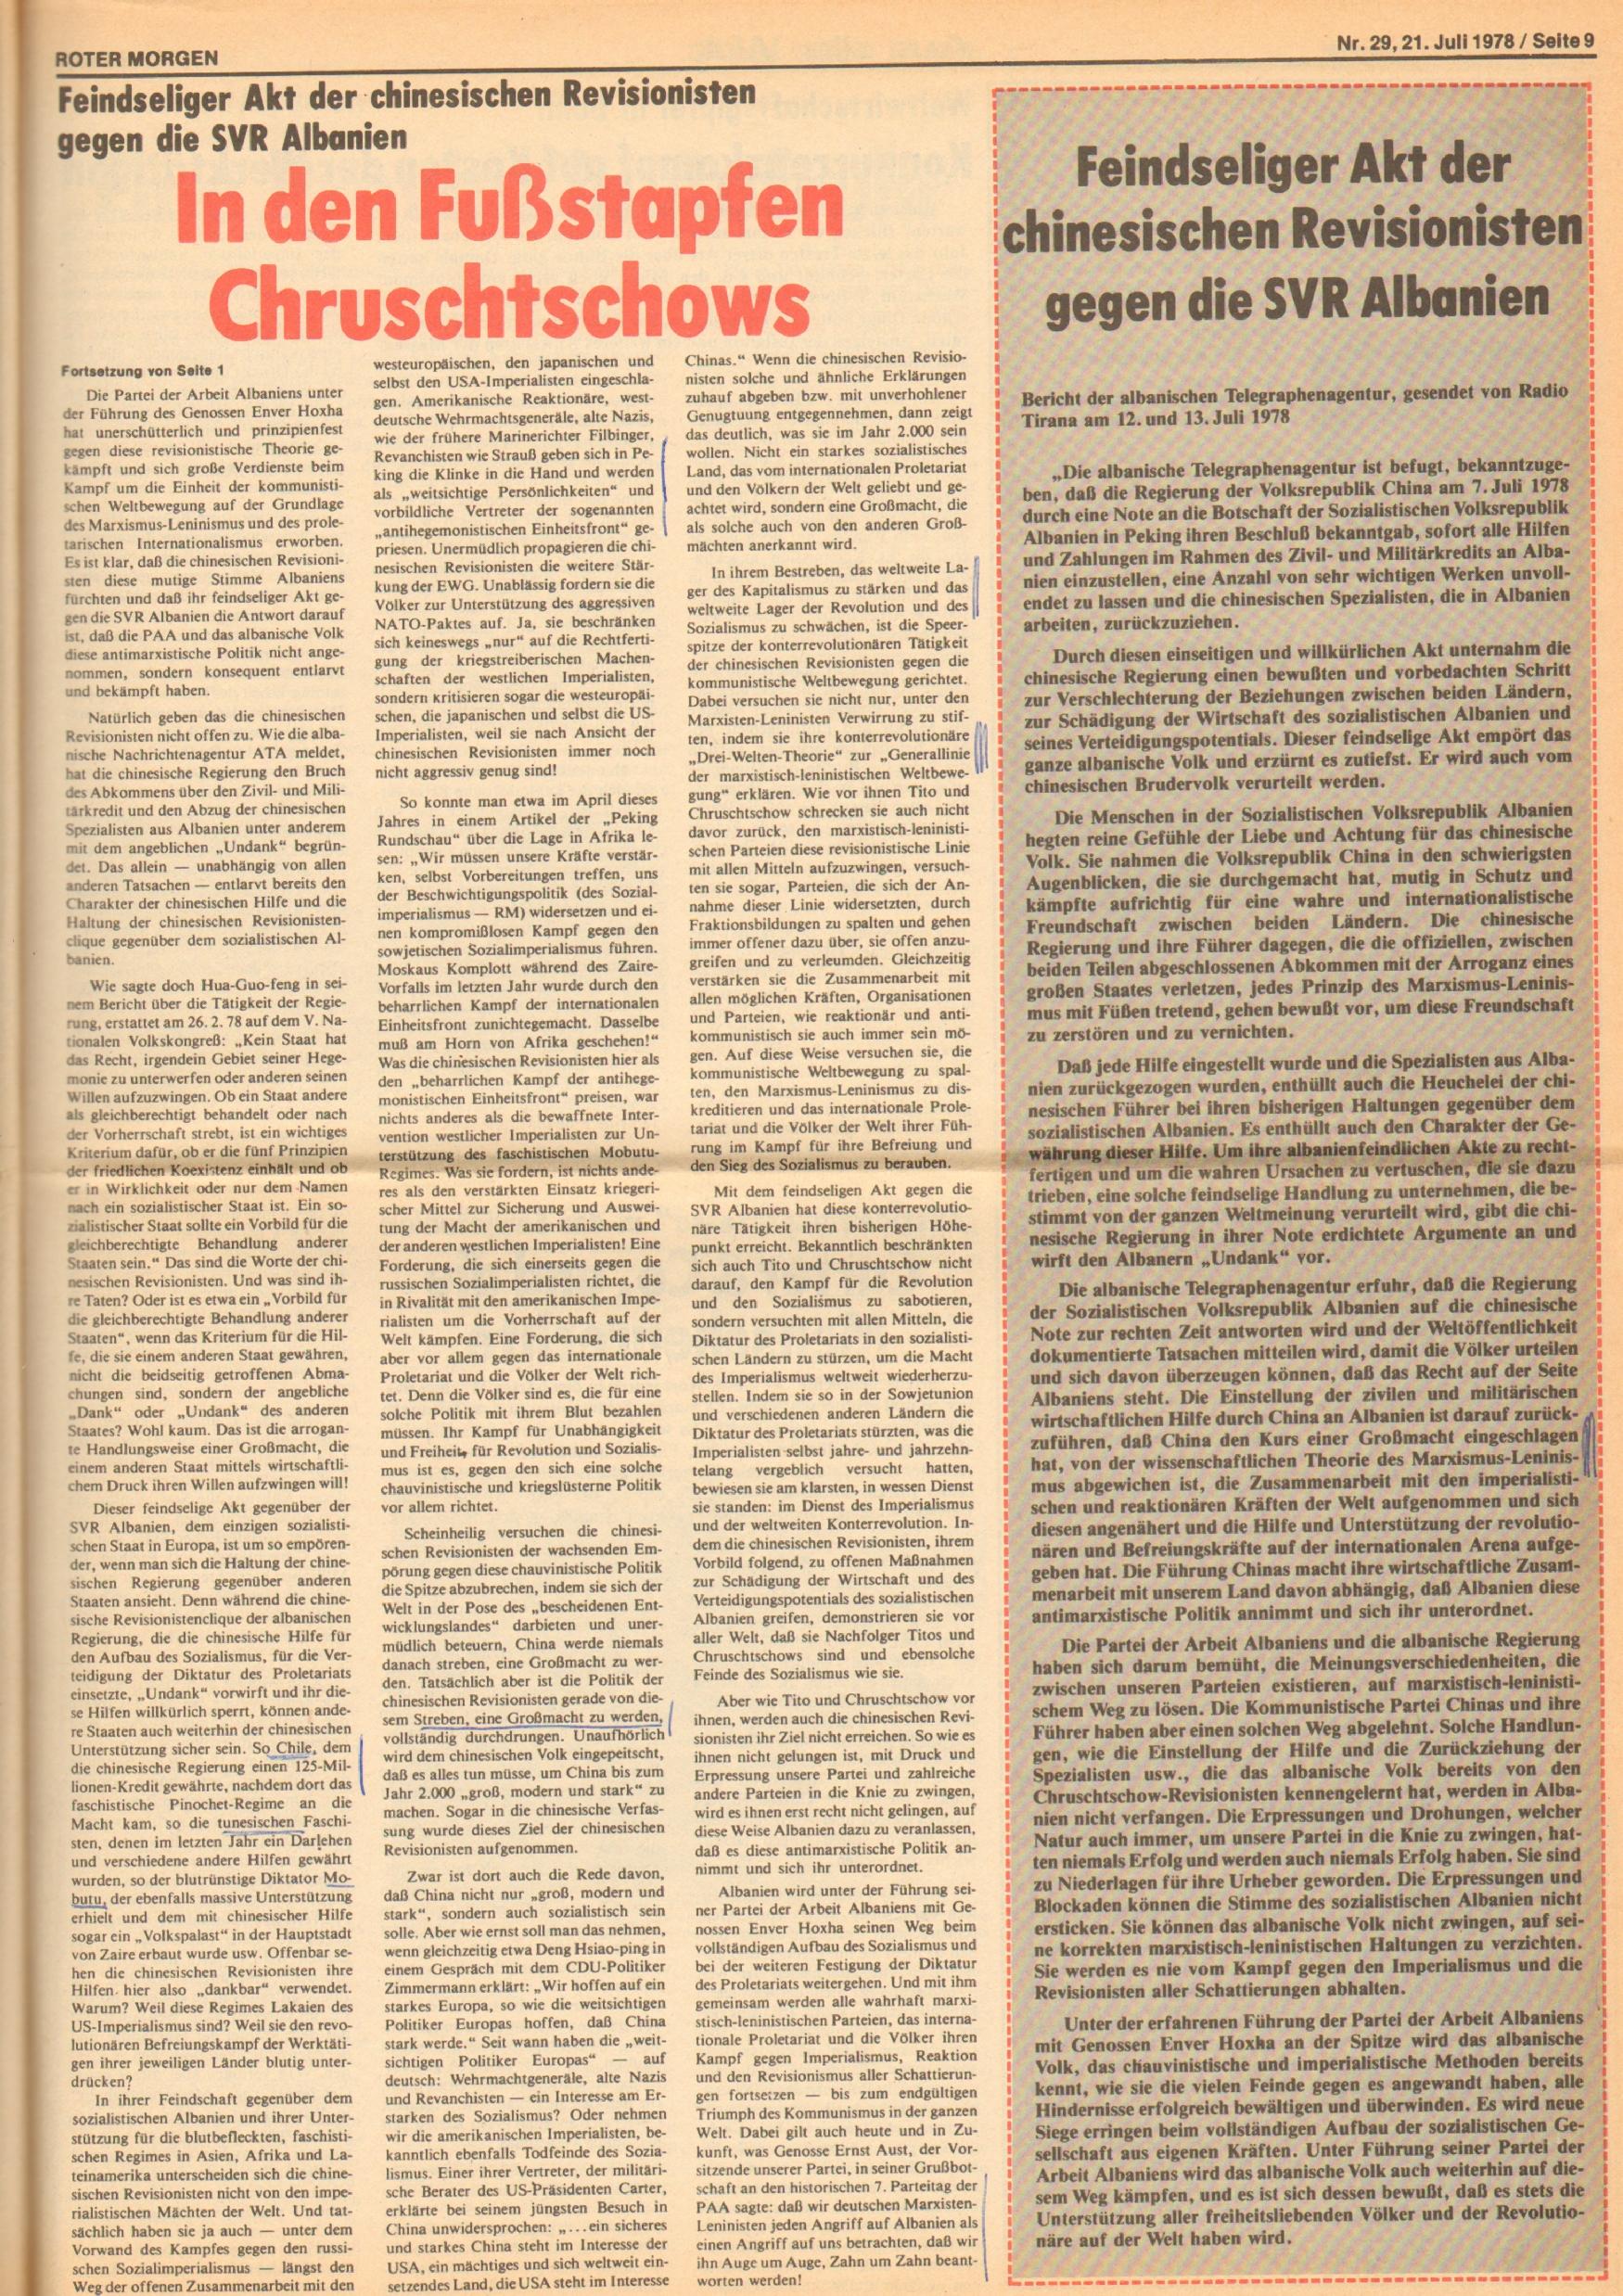 Roter Morgen, 12. Jg., 21. Juli 1978, Nr. 29, Seite 9